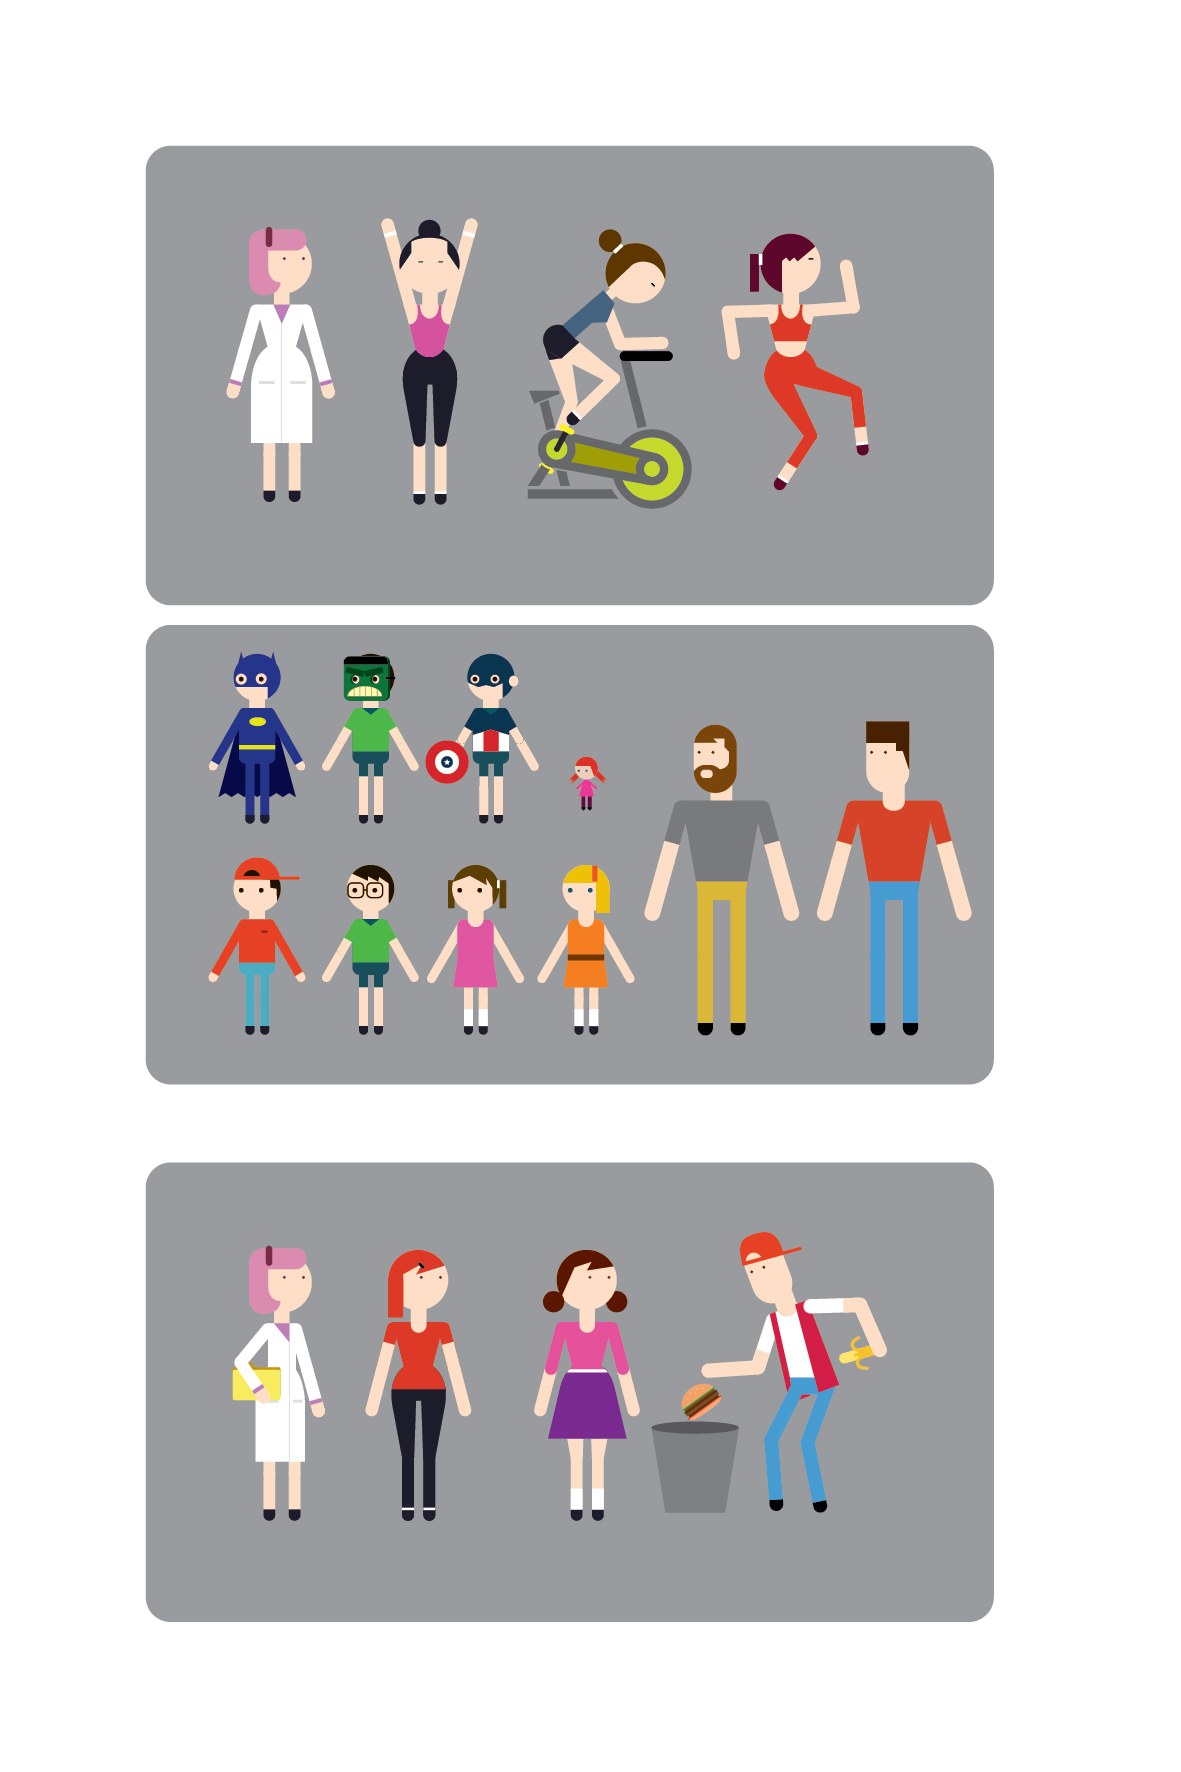 personajes-01.jpg